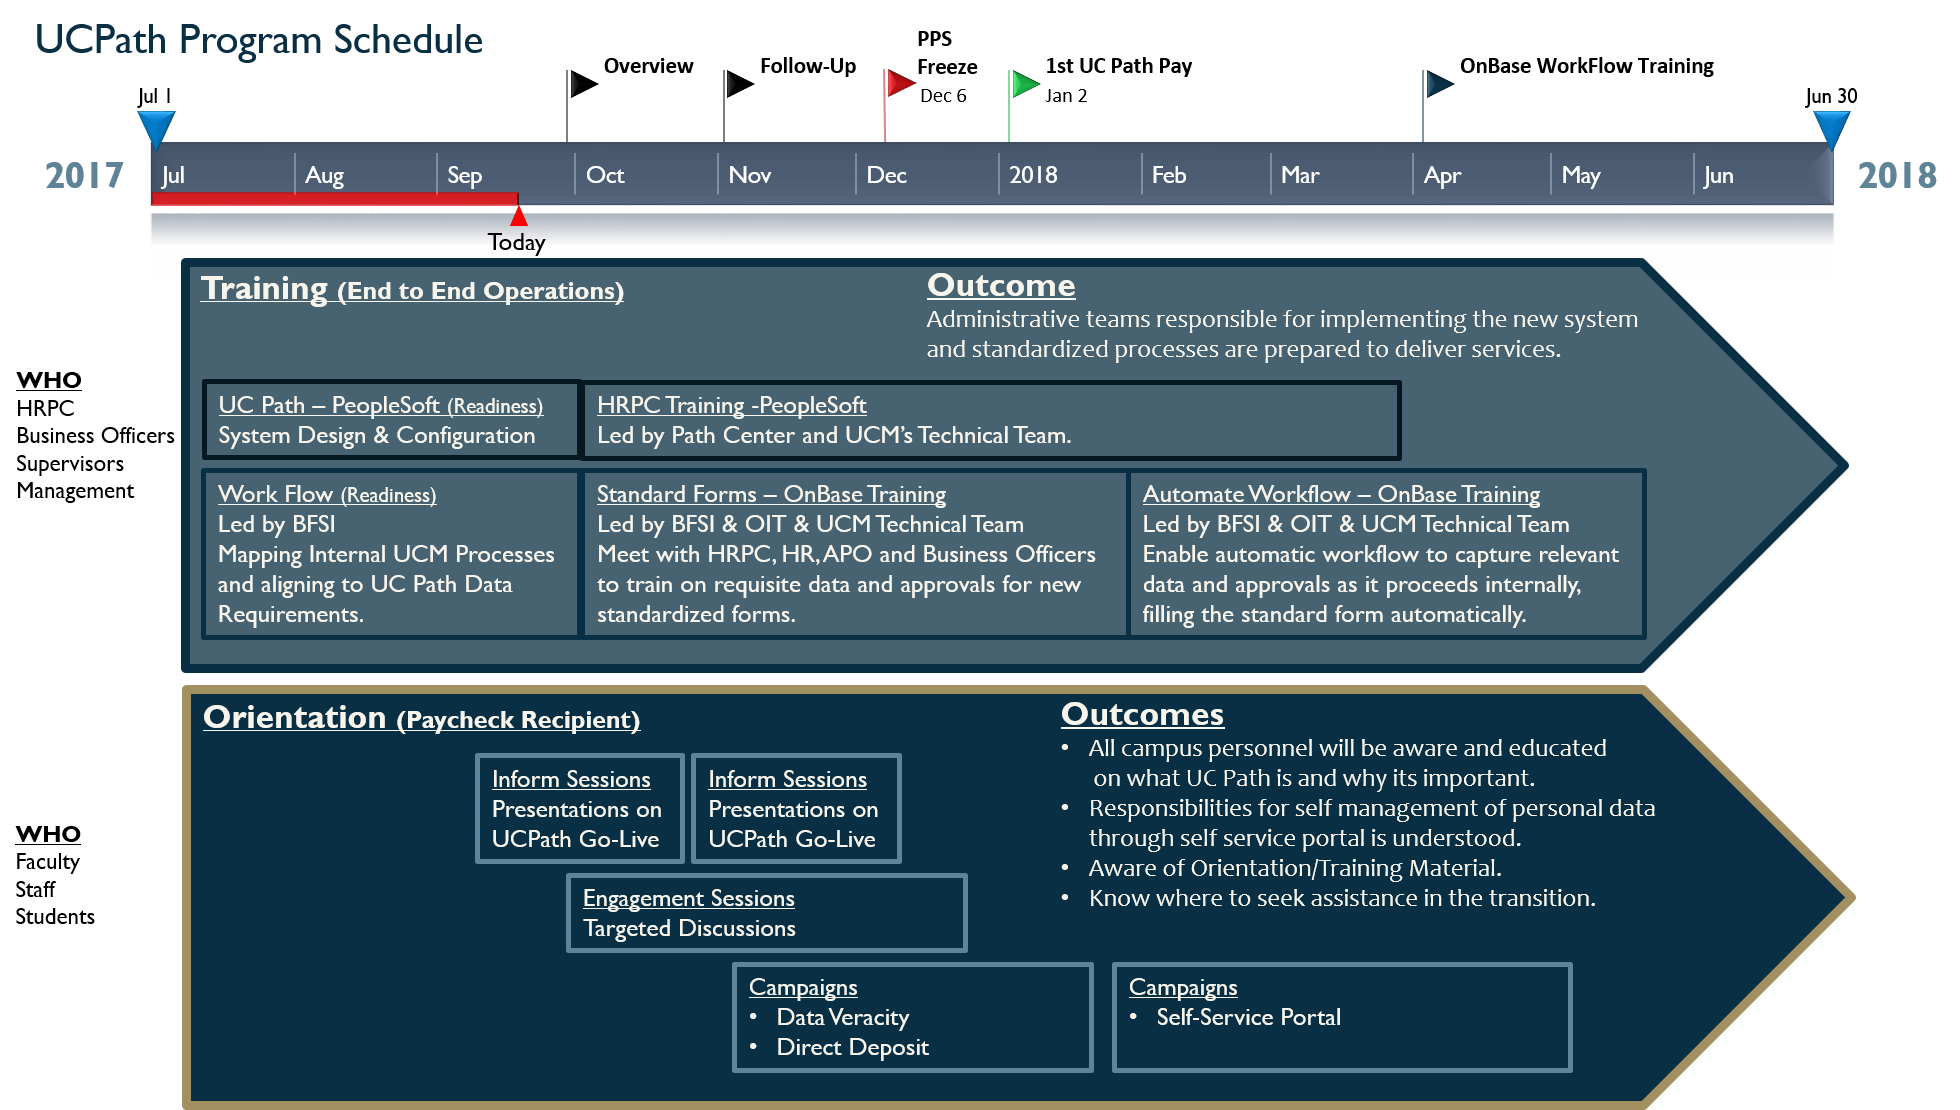 UC Path Program Schedule